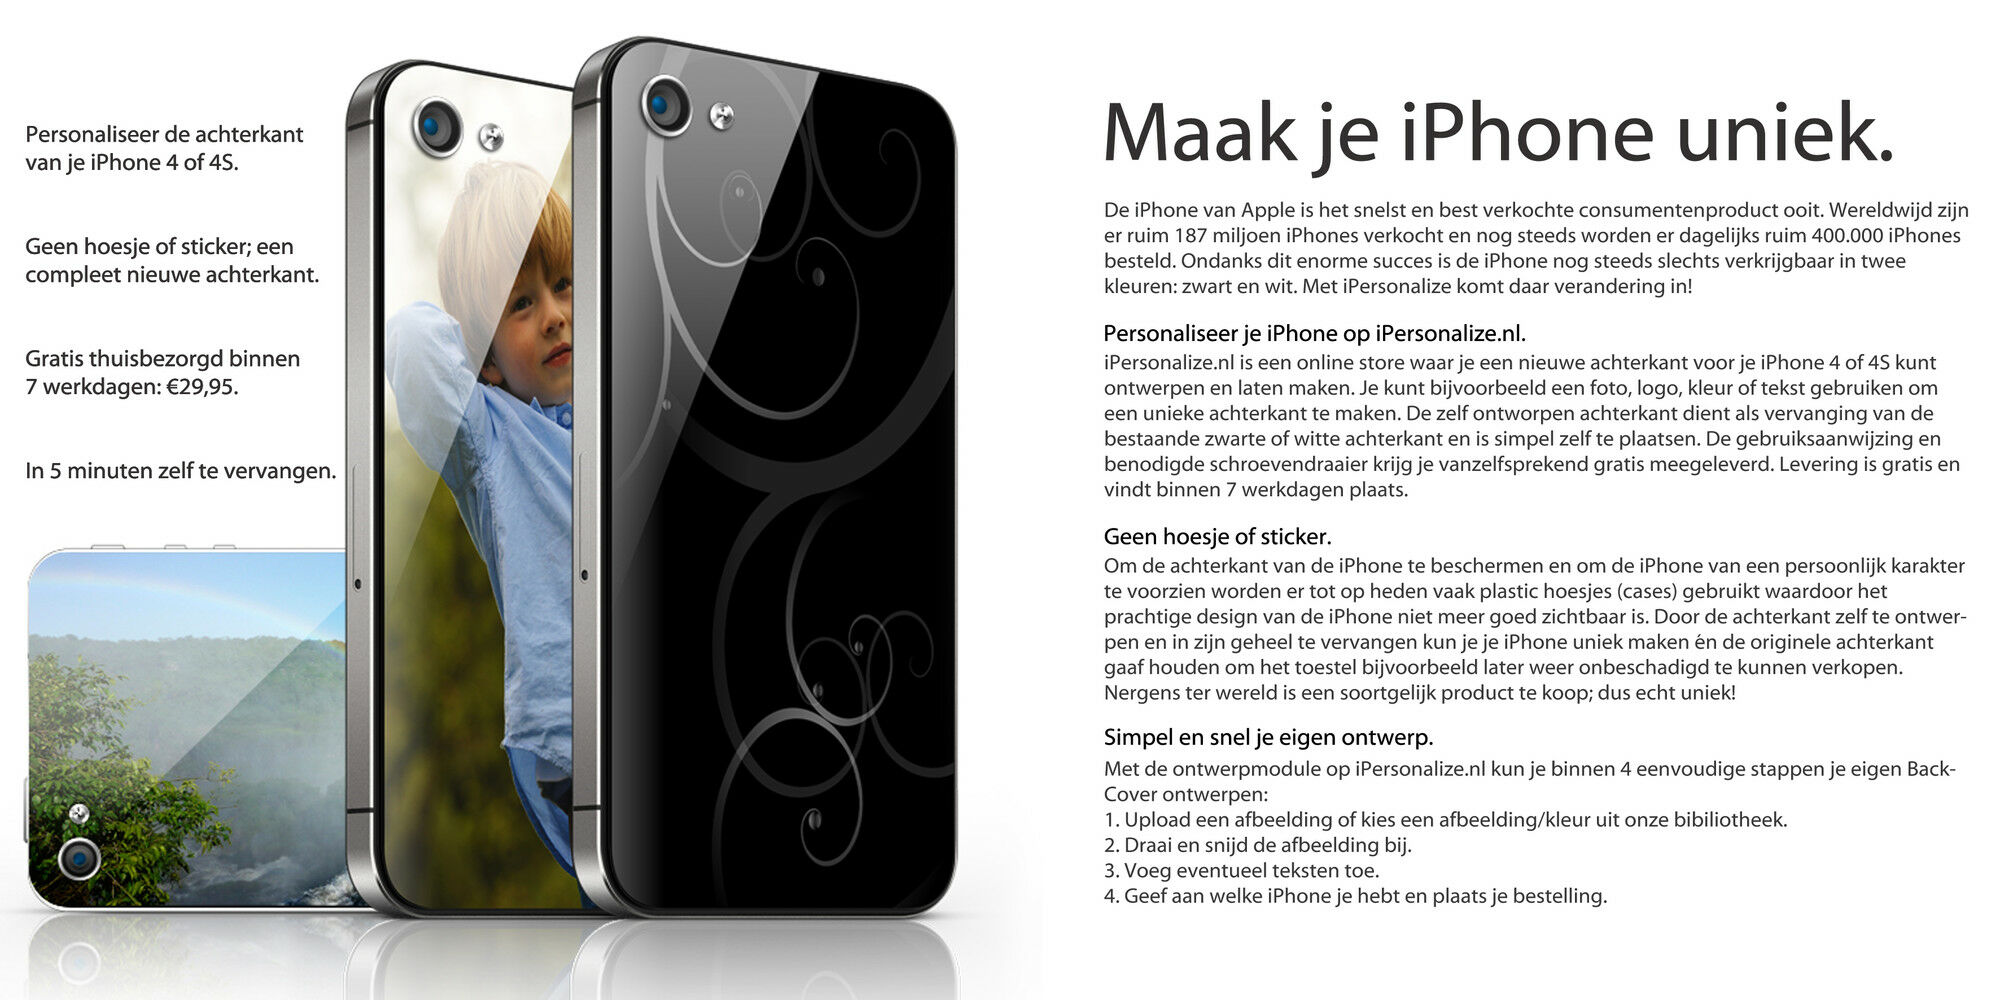 Nederlandse startup ontwikkelt unieke iPhone accessoire